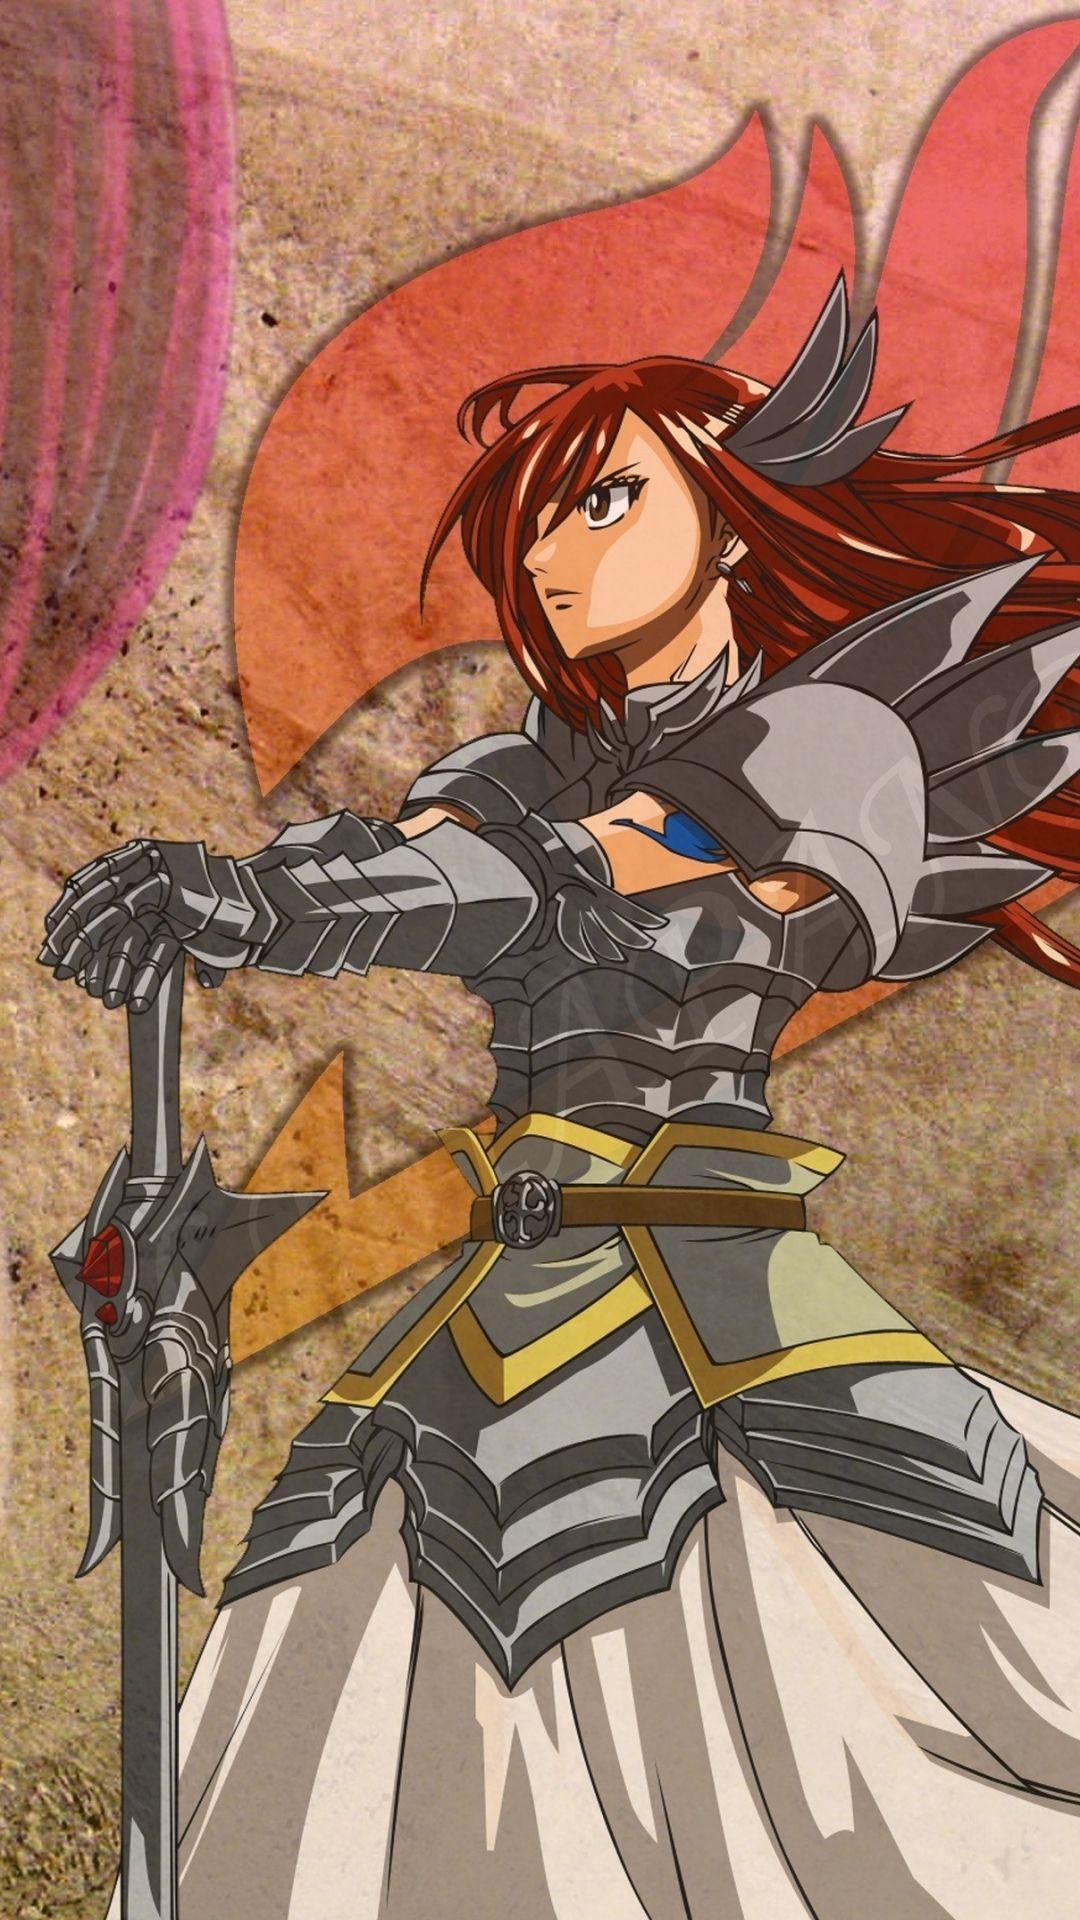 HD Wallpaper 30 Fairy tail, Fairy tail anime, Cartoon